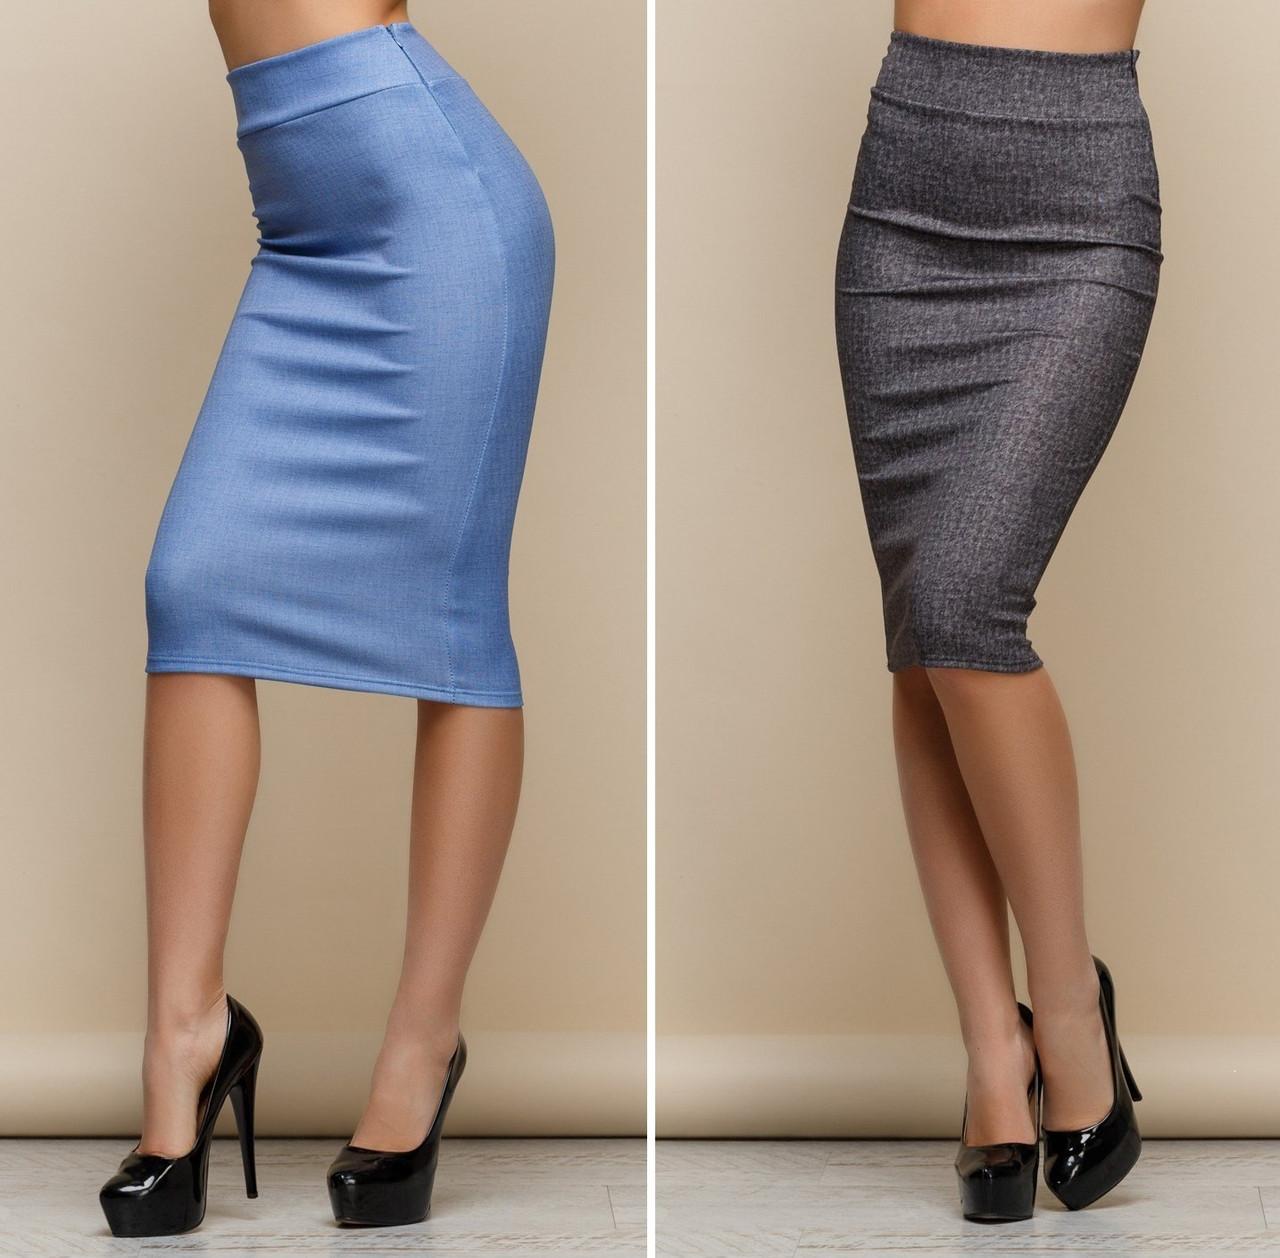 cc682cd55a6 Женская юбка карандаш под джинс -